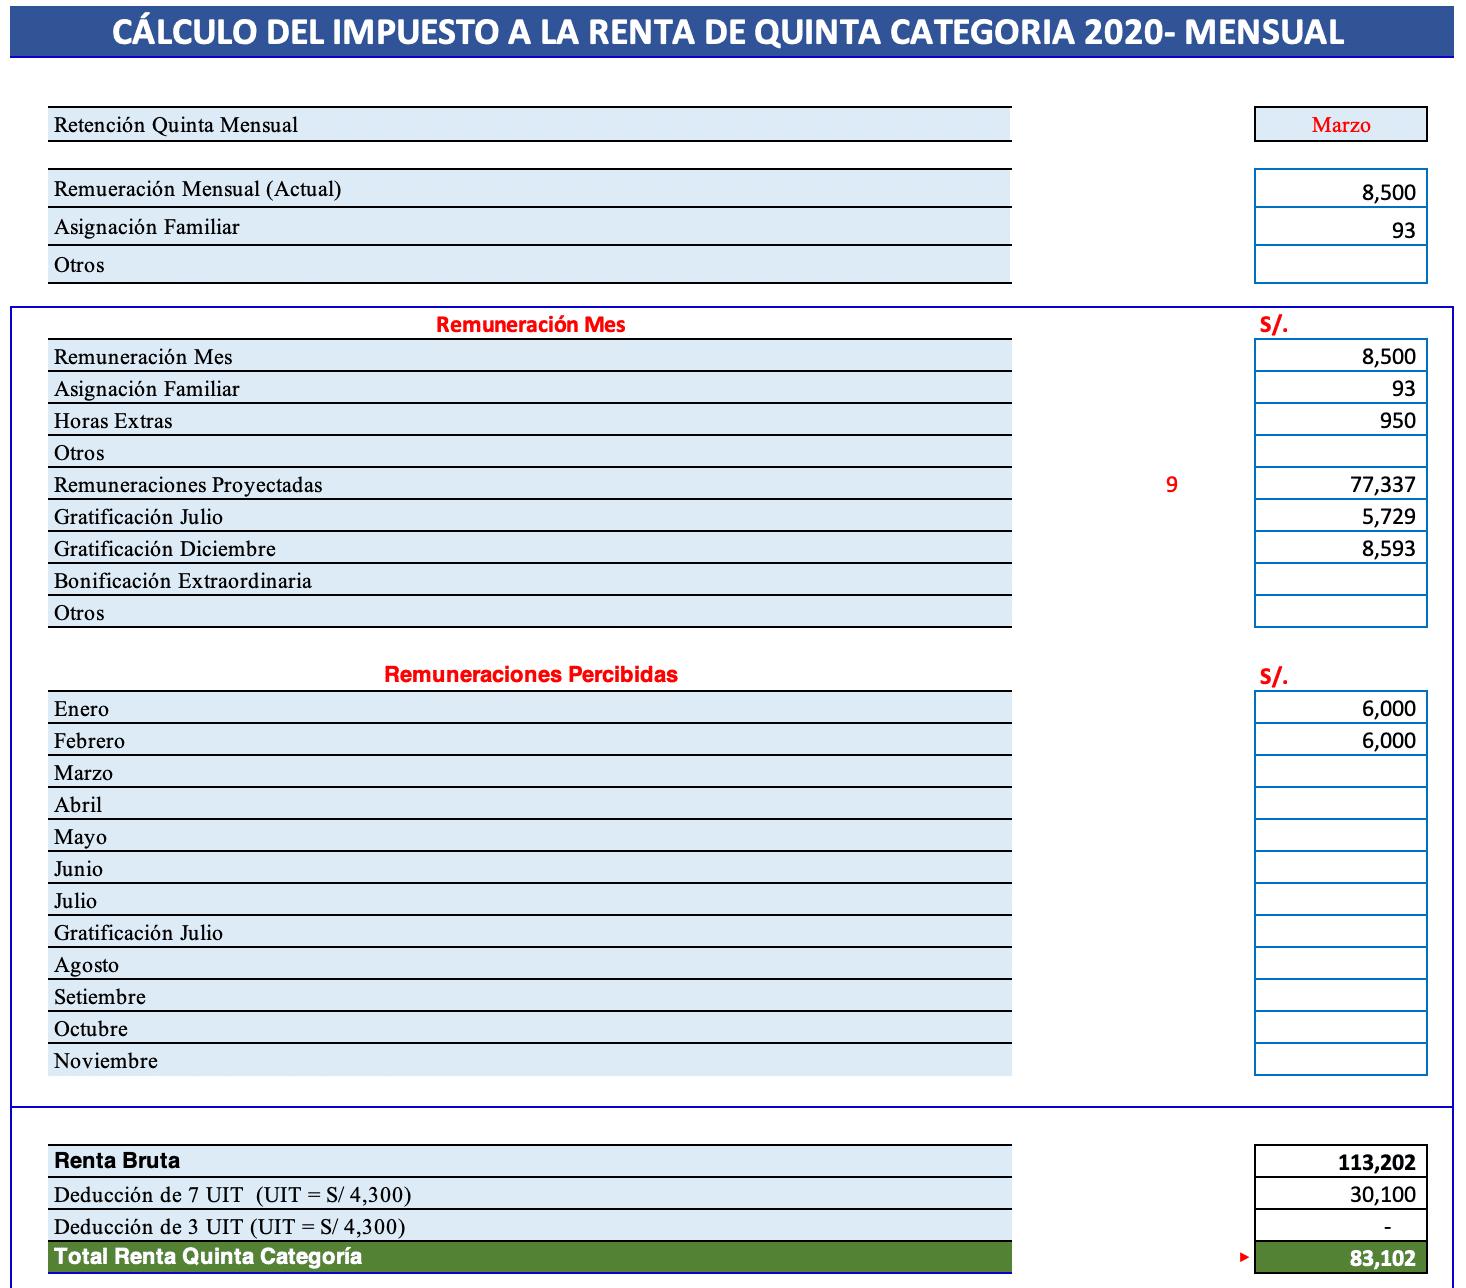 Renta de Quinta Categoria 2020